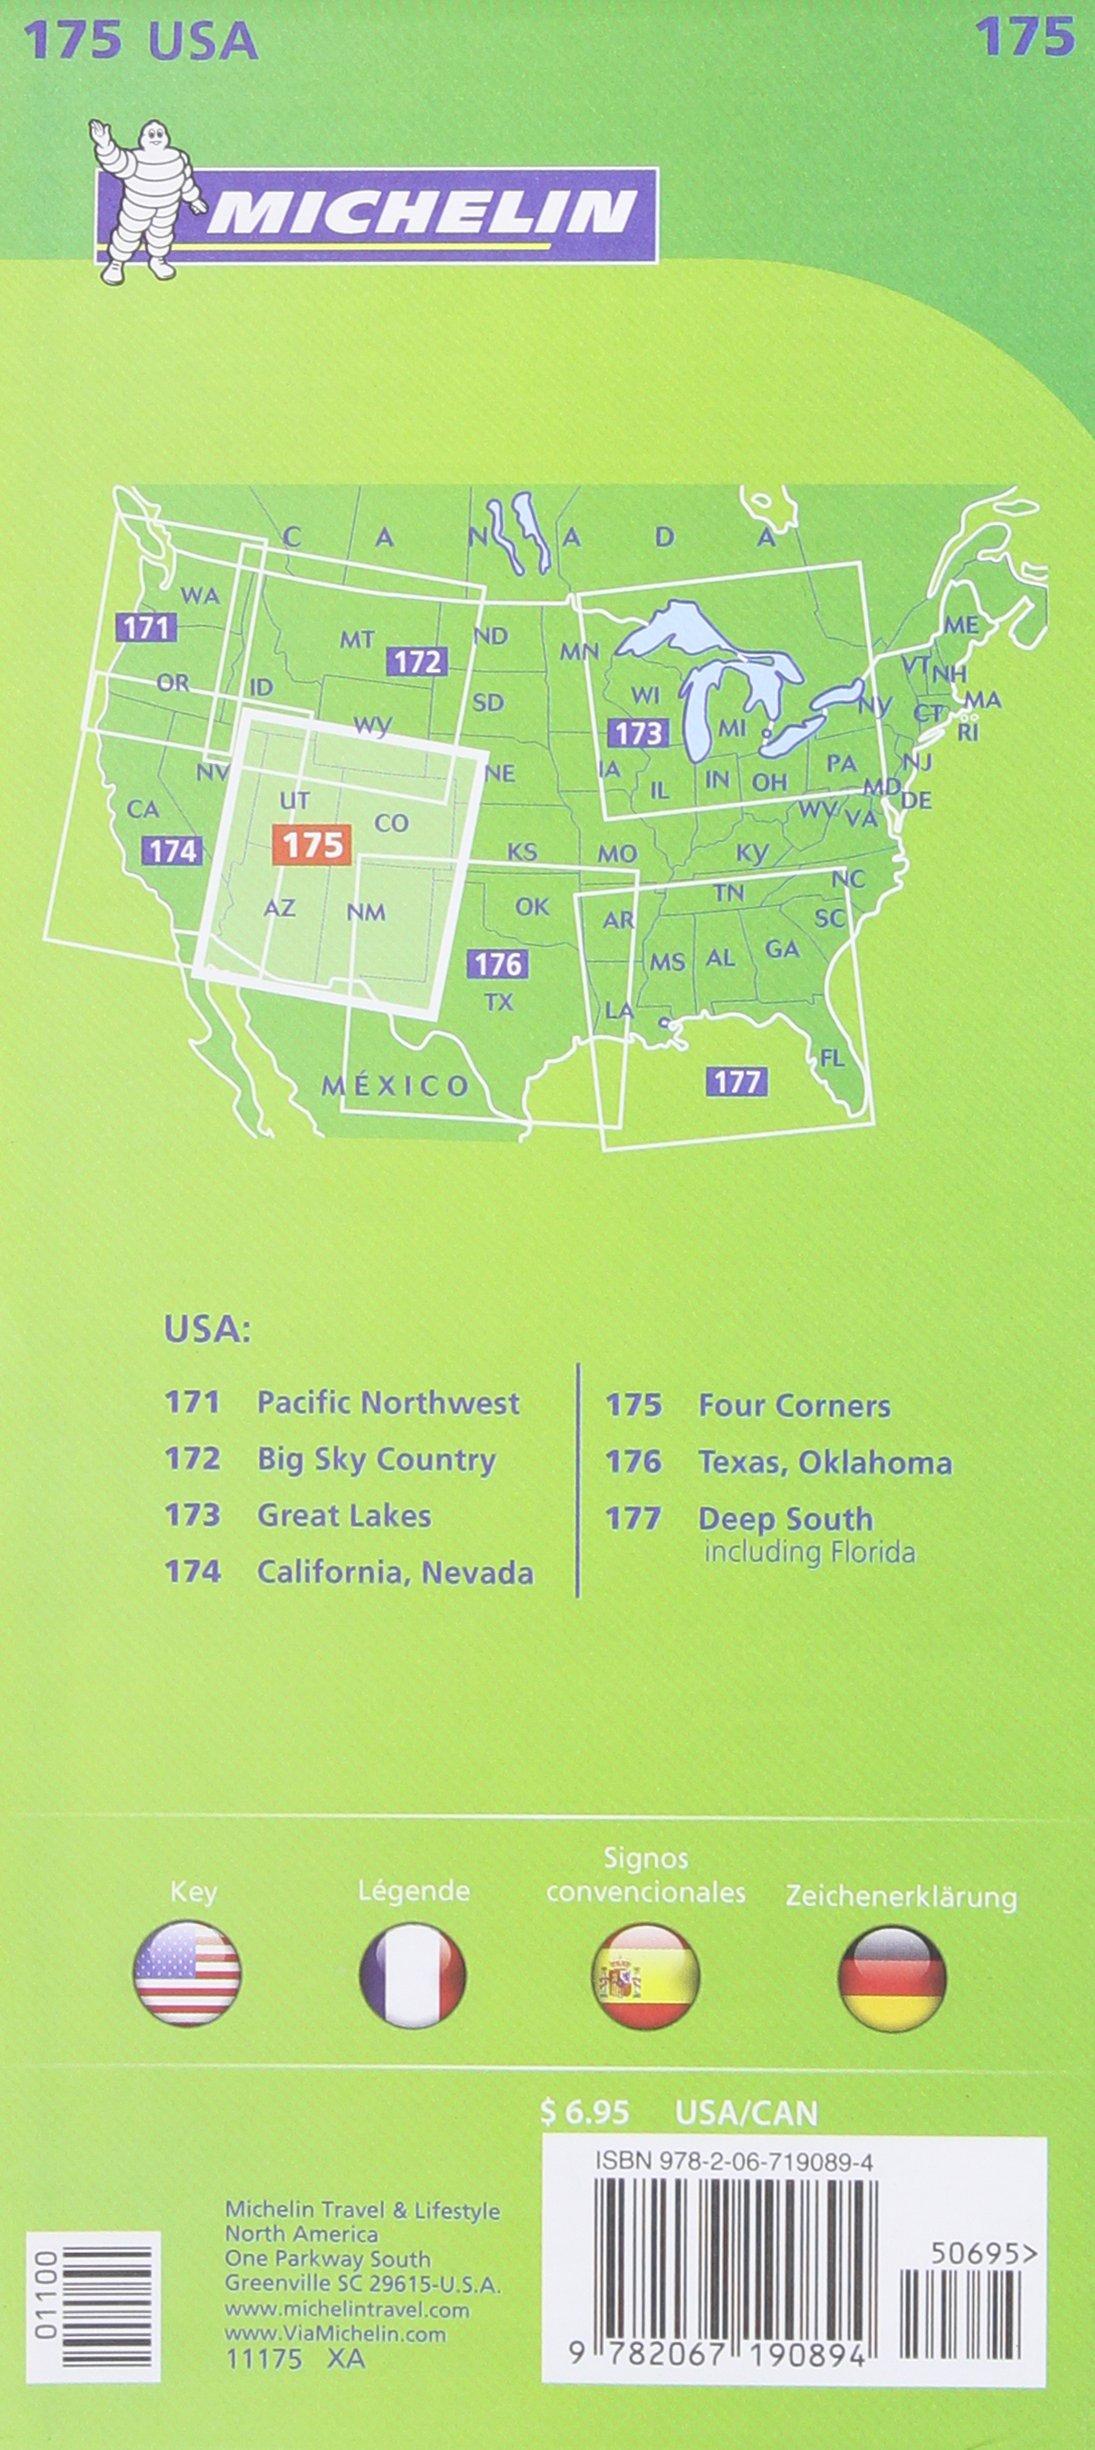 Michelin USA Four Corners Map 175 (Michelin Zoom USA Maps): Michelin on 4 corners region, 4 corners states, 4 corners map with counties, 4 corners map western us, 4 corners utah-colorado, 4 corners logo, 4 corners colorado map, 4 corners us a platform, 4 corners national parks map,